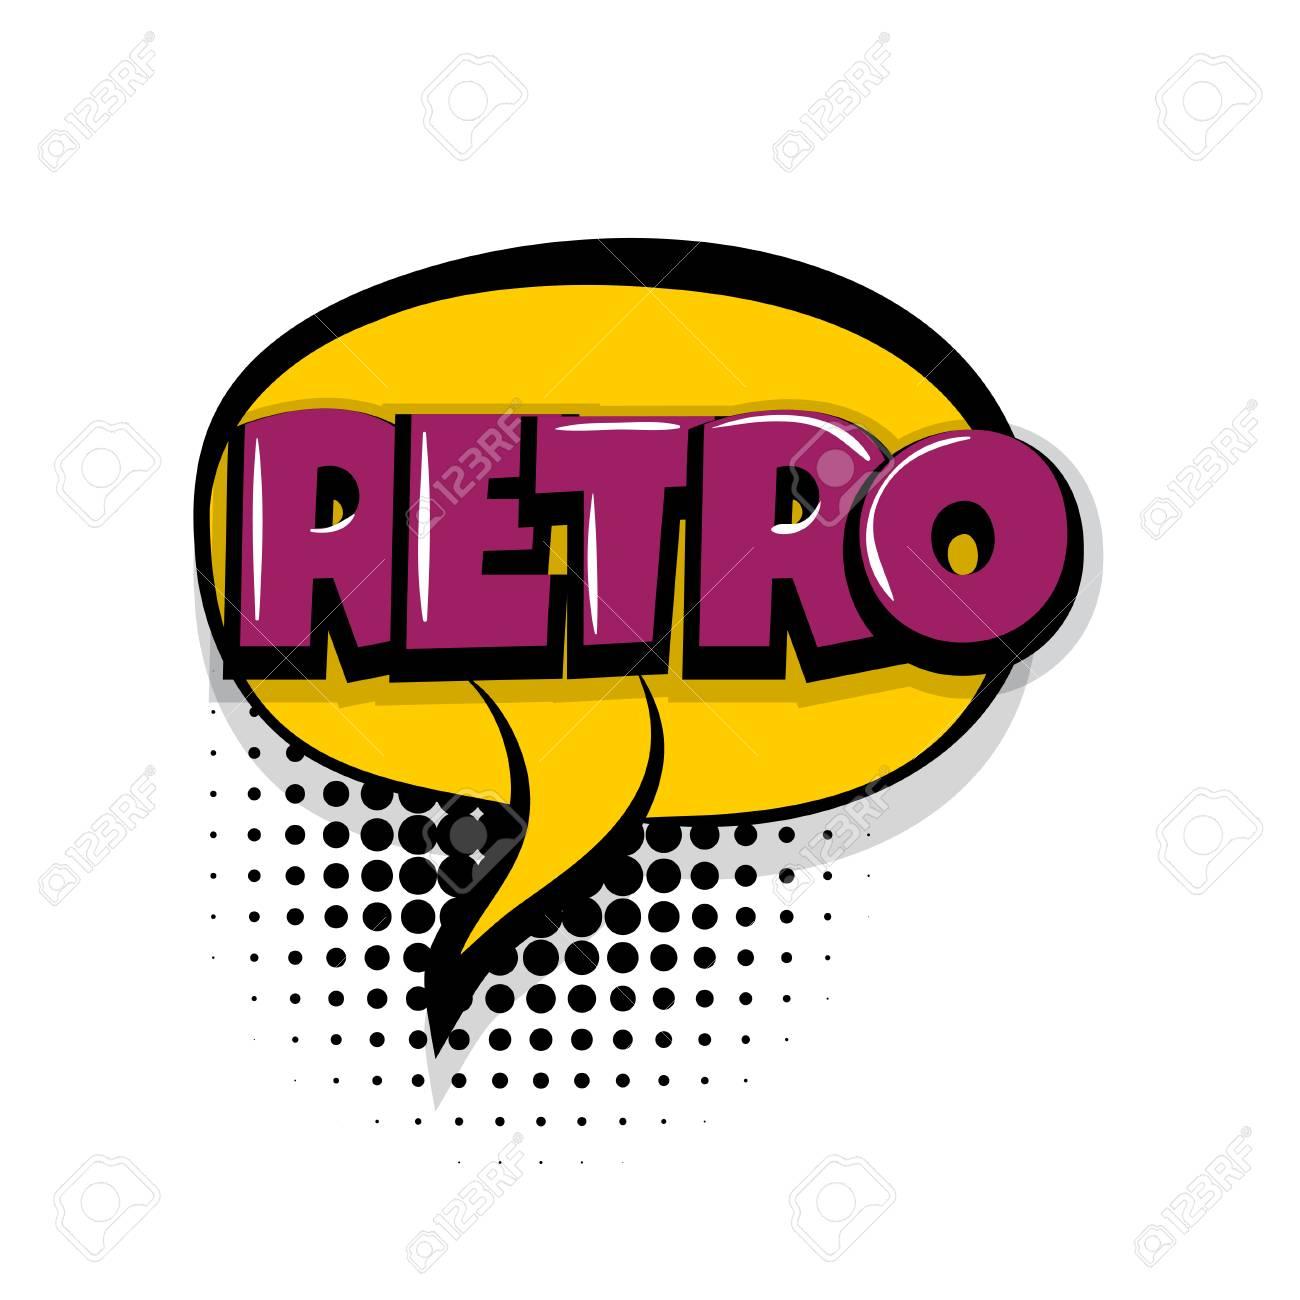 retro vintage comic text speech bubble balloon pop art style